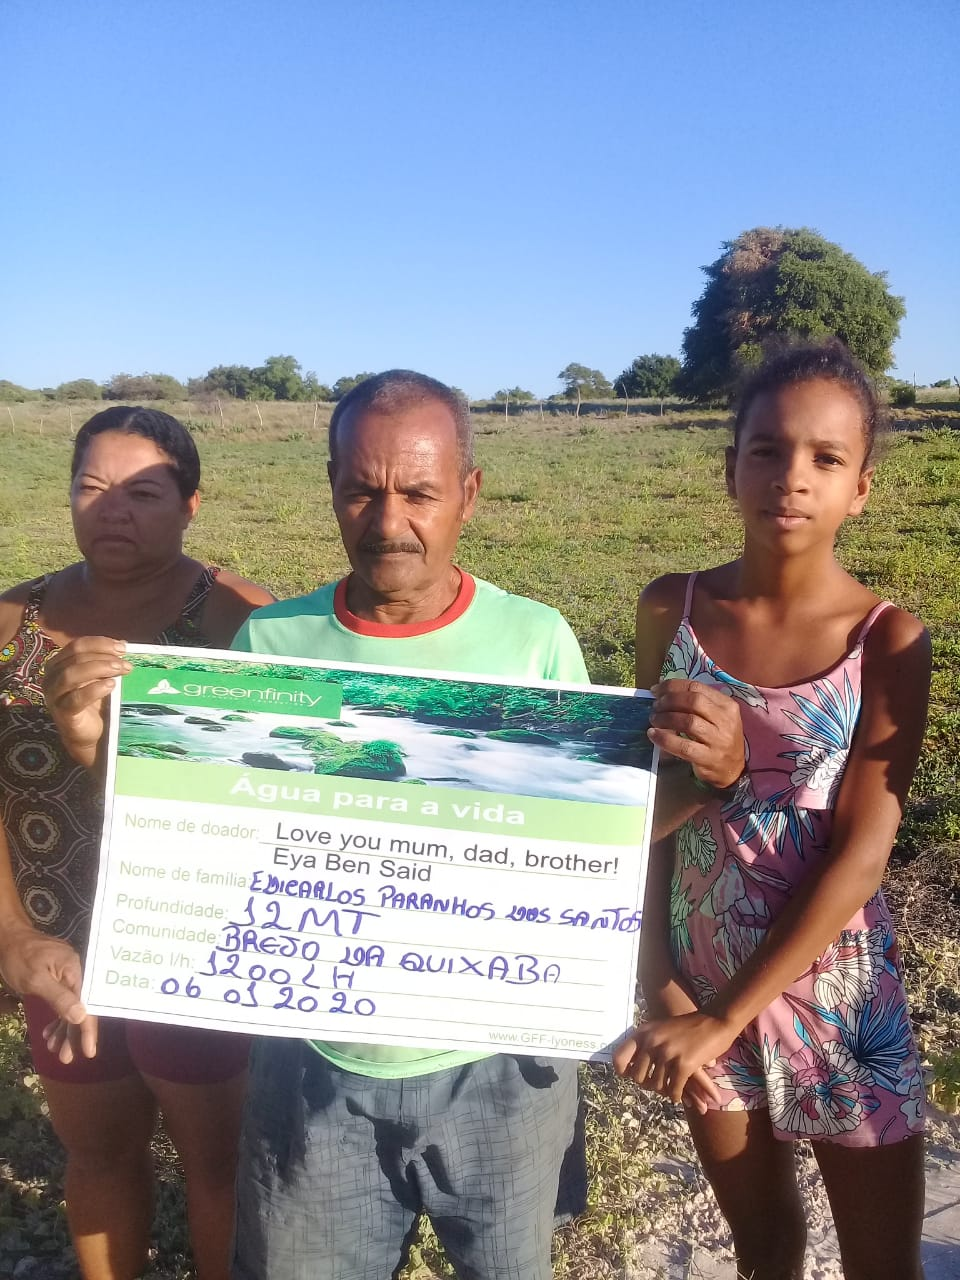 2021-01-06 Bahia - Image 1